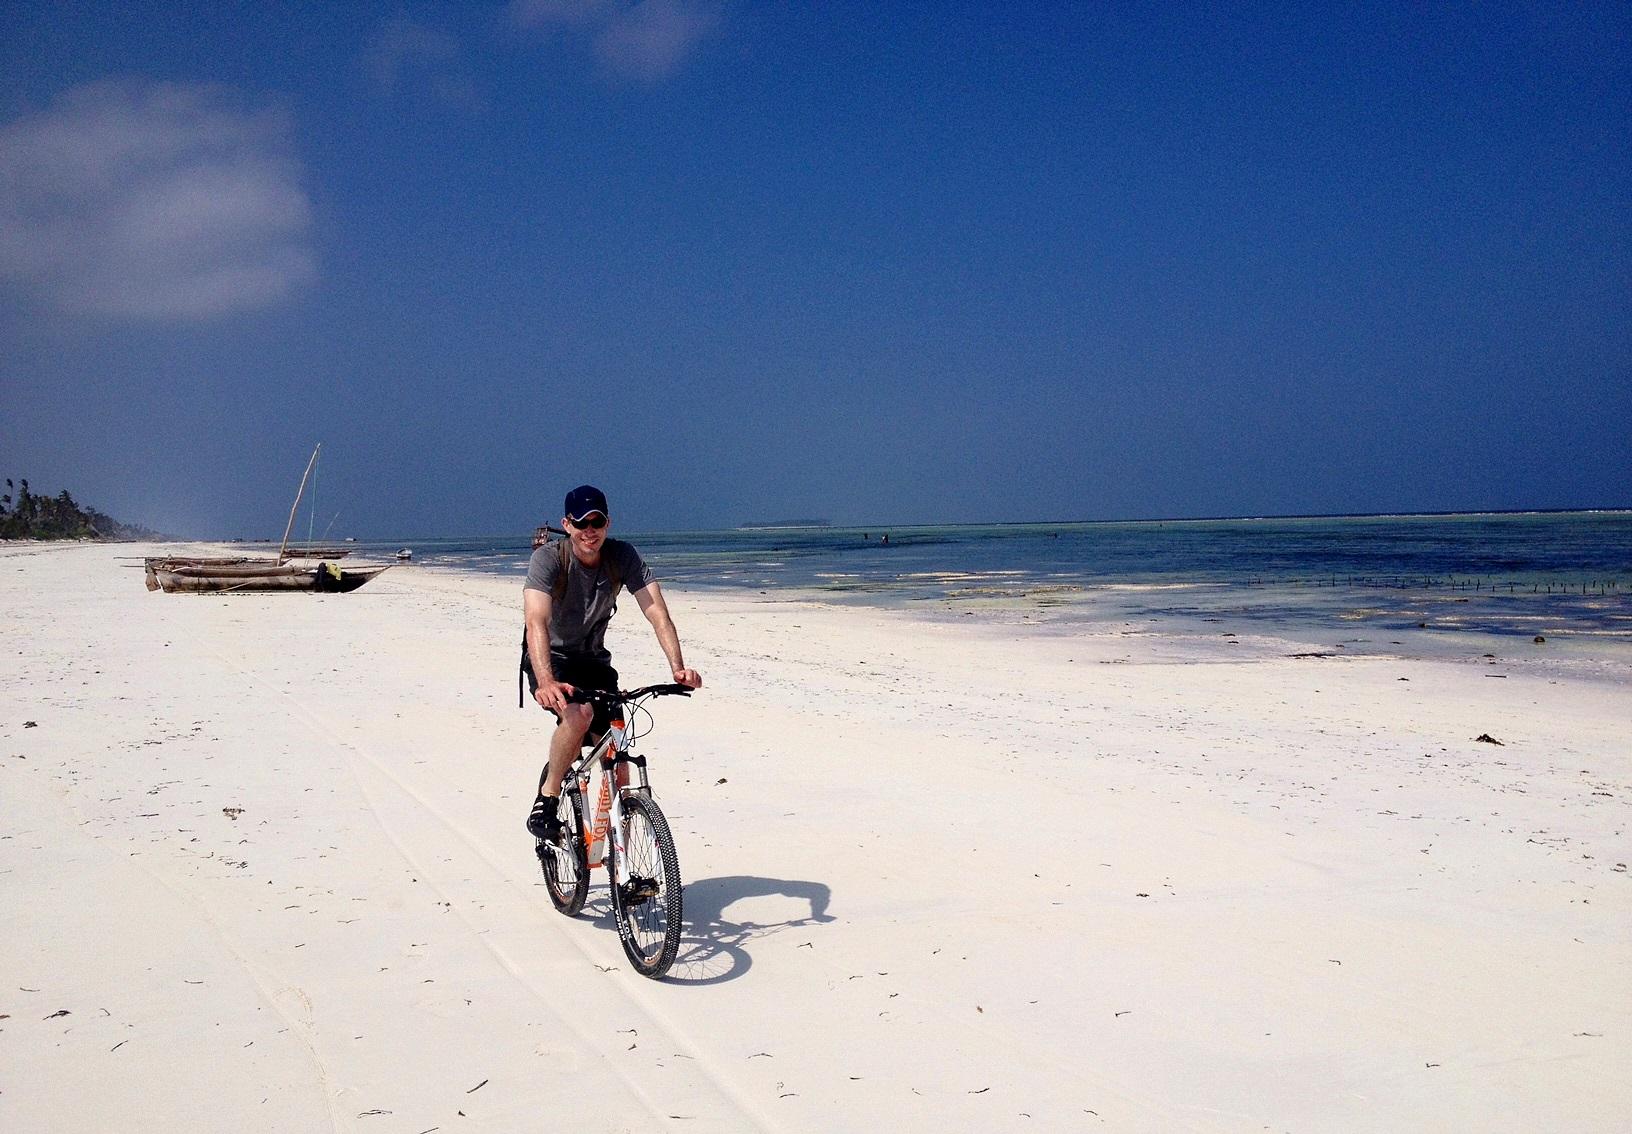 On the White Sands ofZanzibar